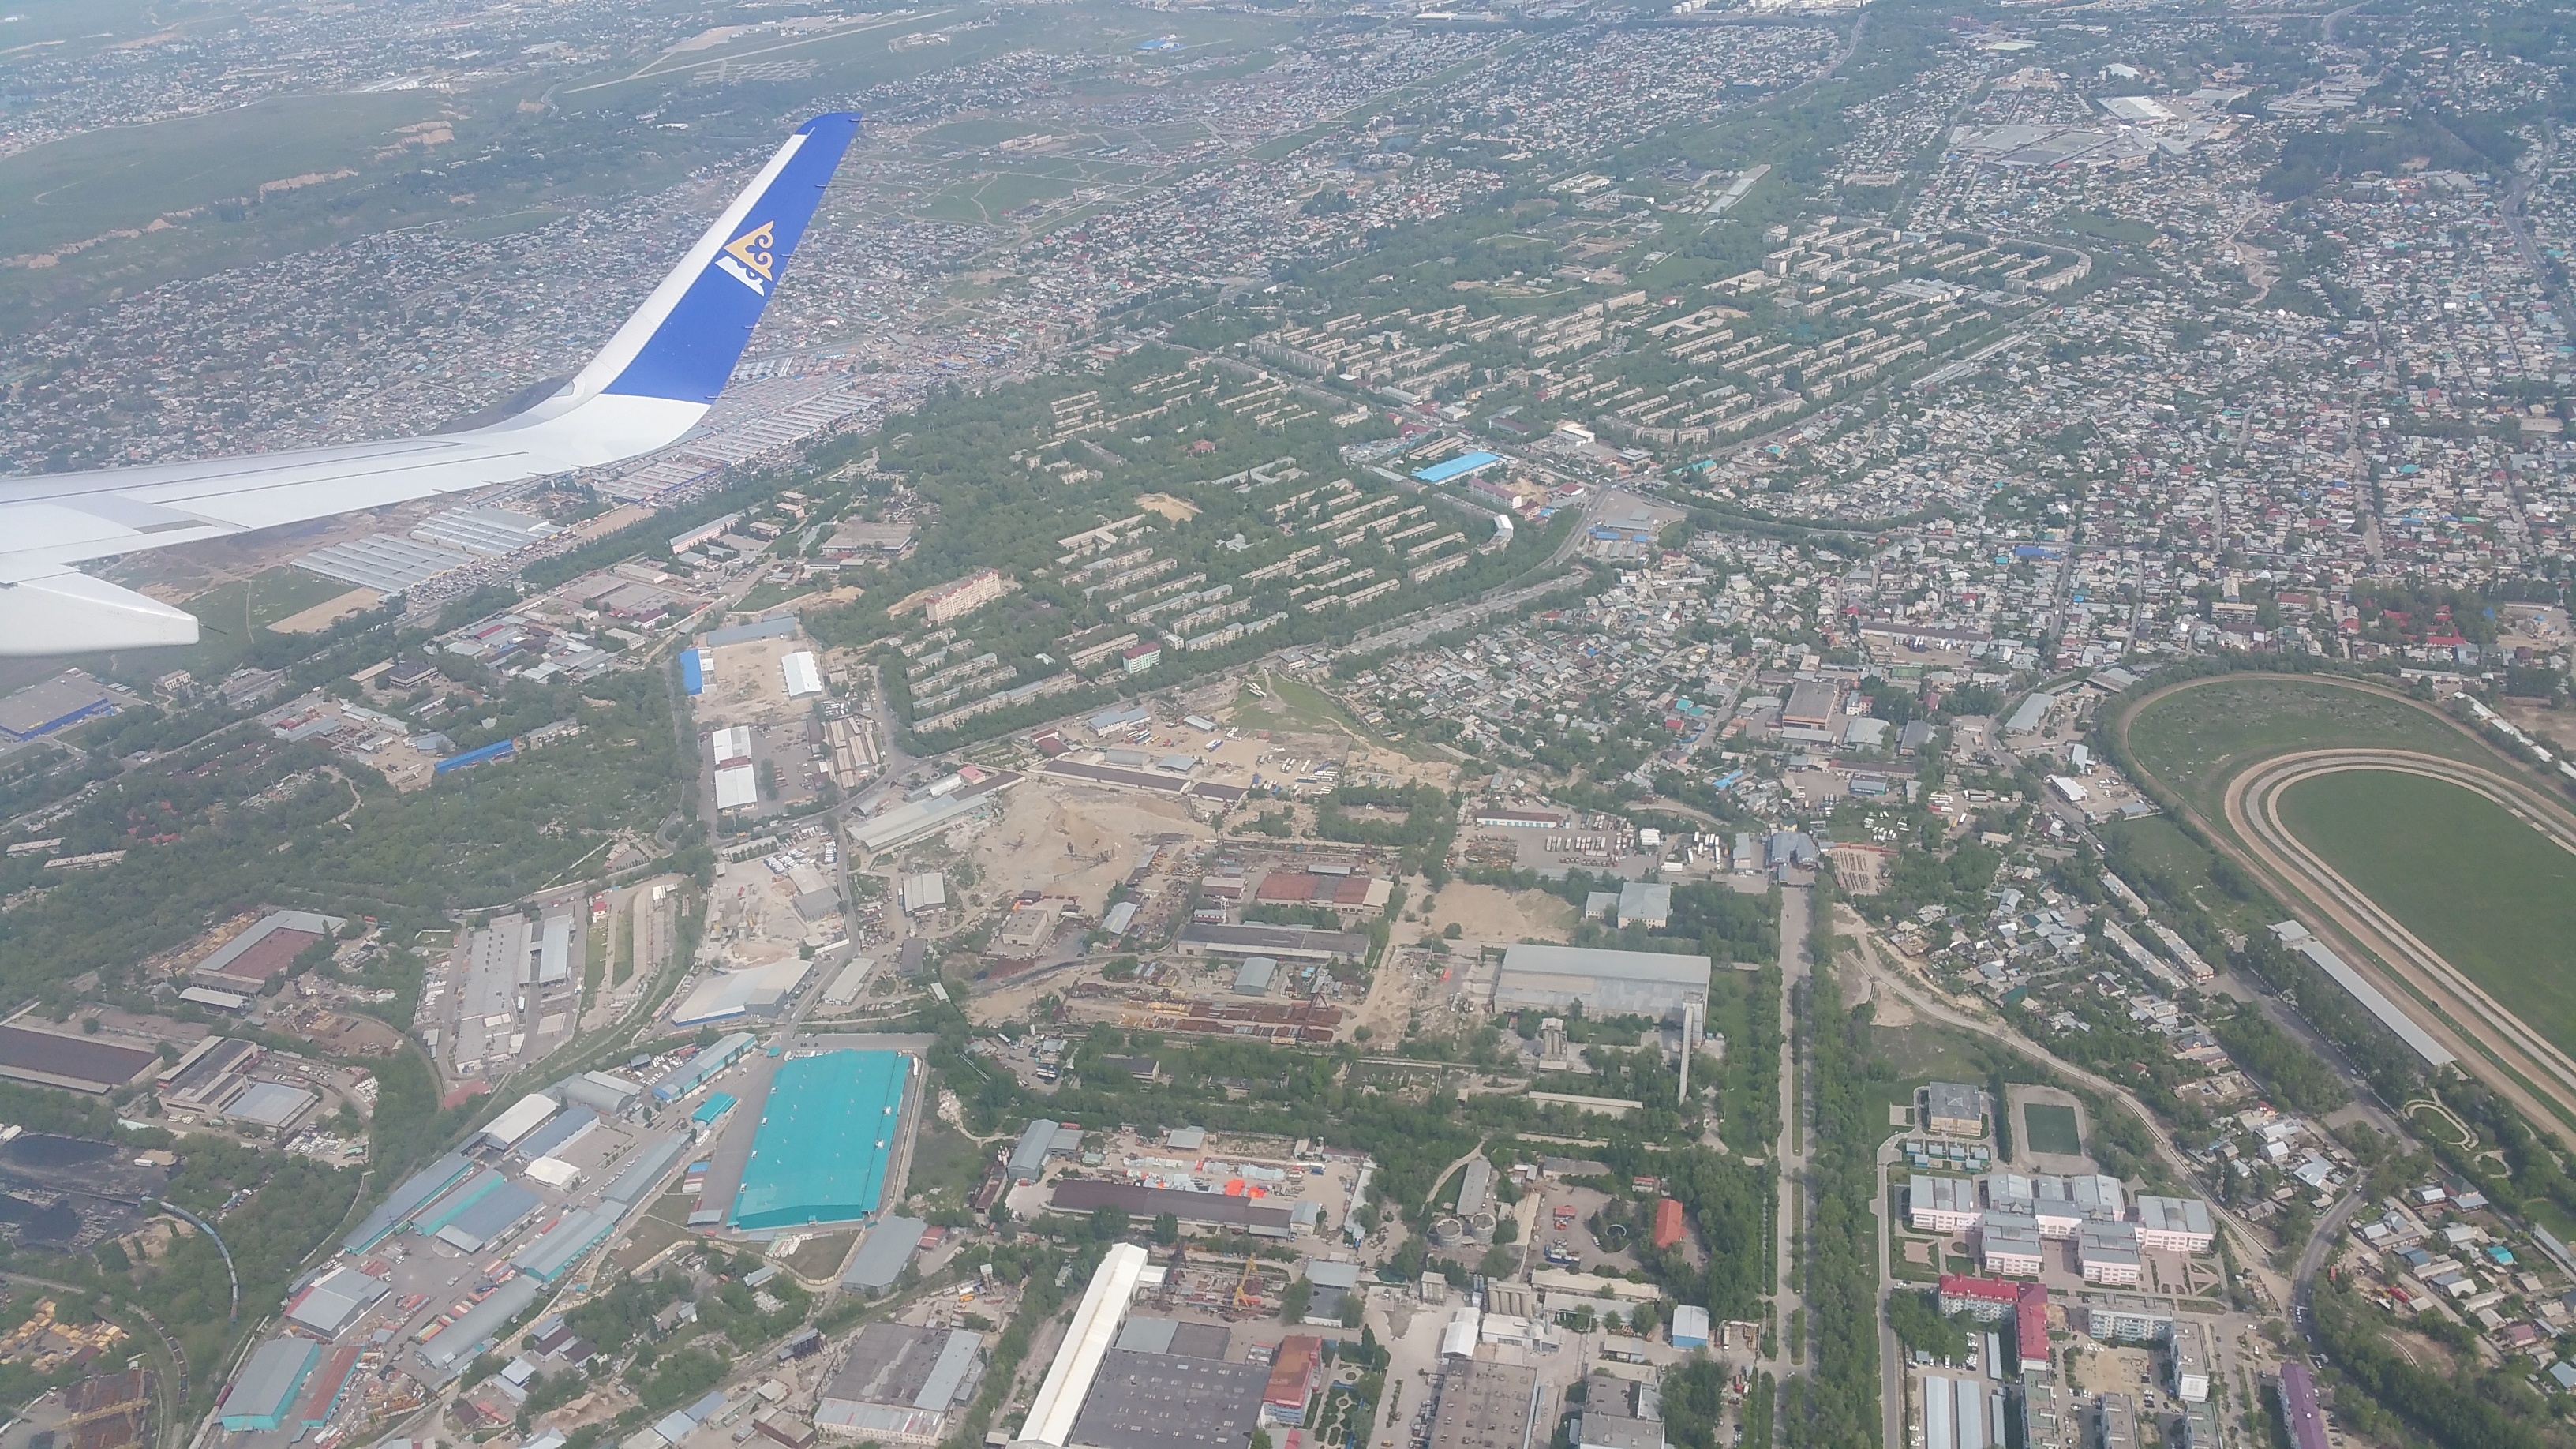 Air Astana flight over Almaty, Kazakhstan, in May, 2015.